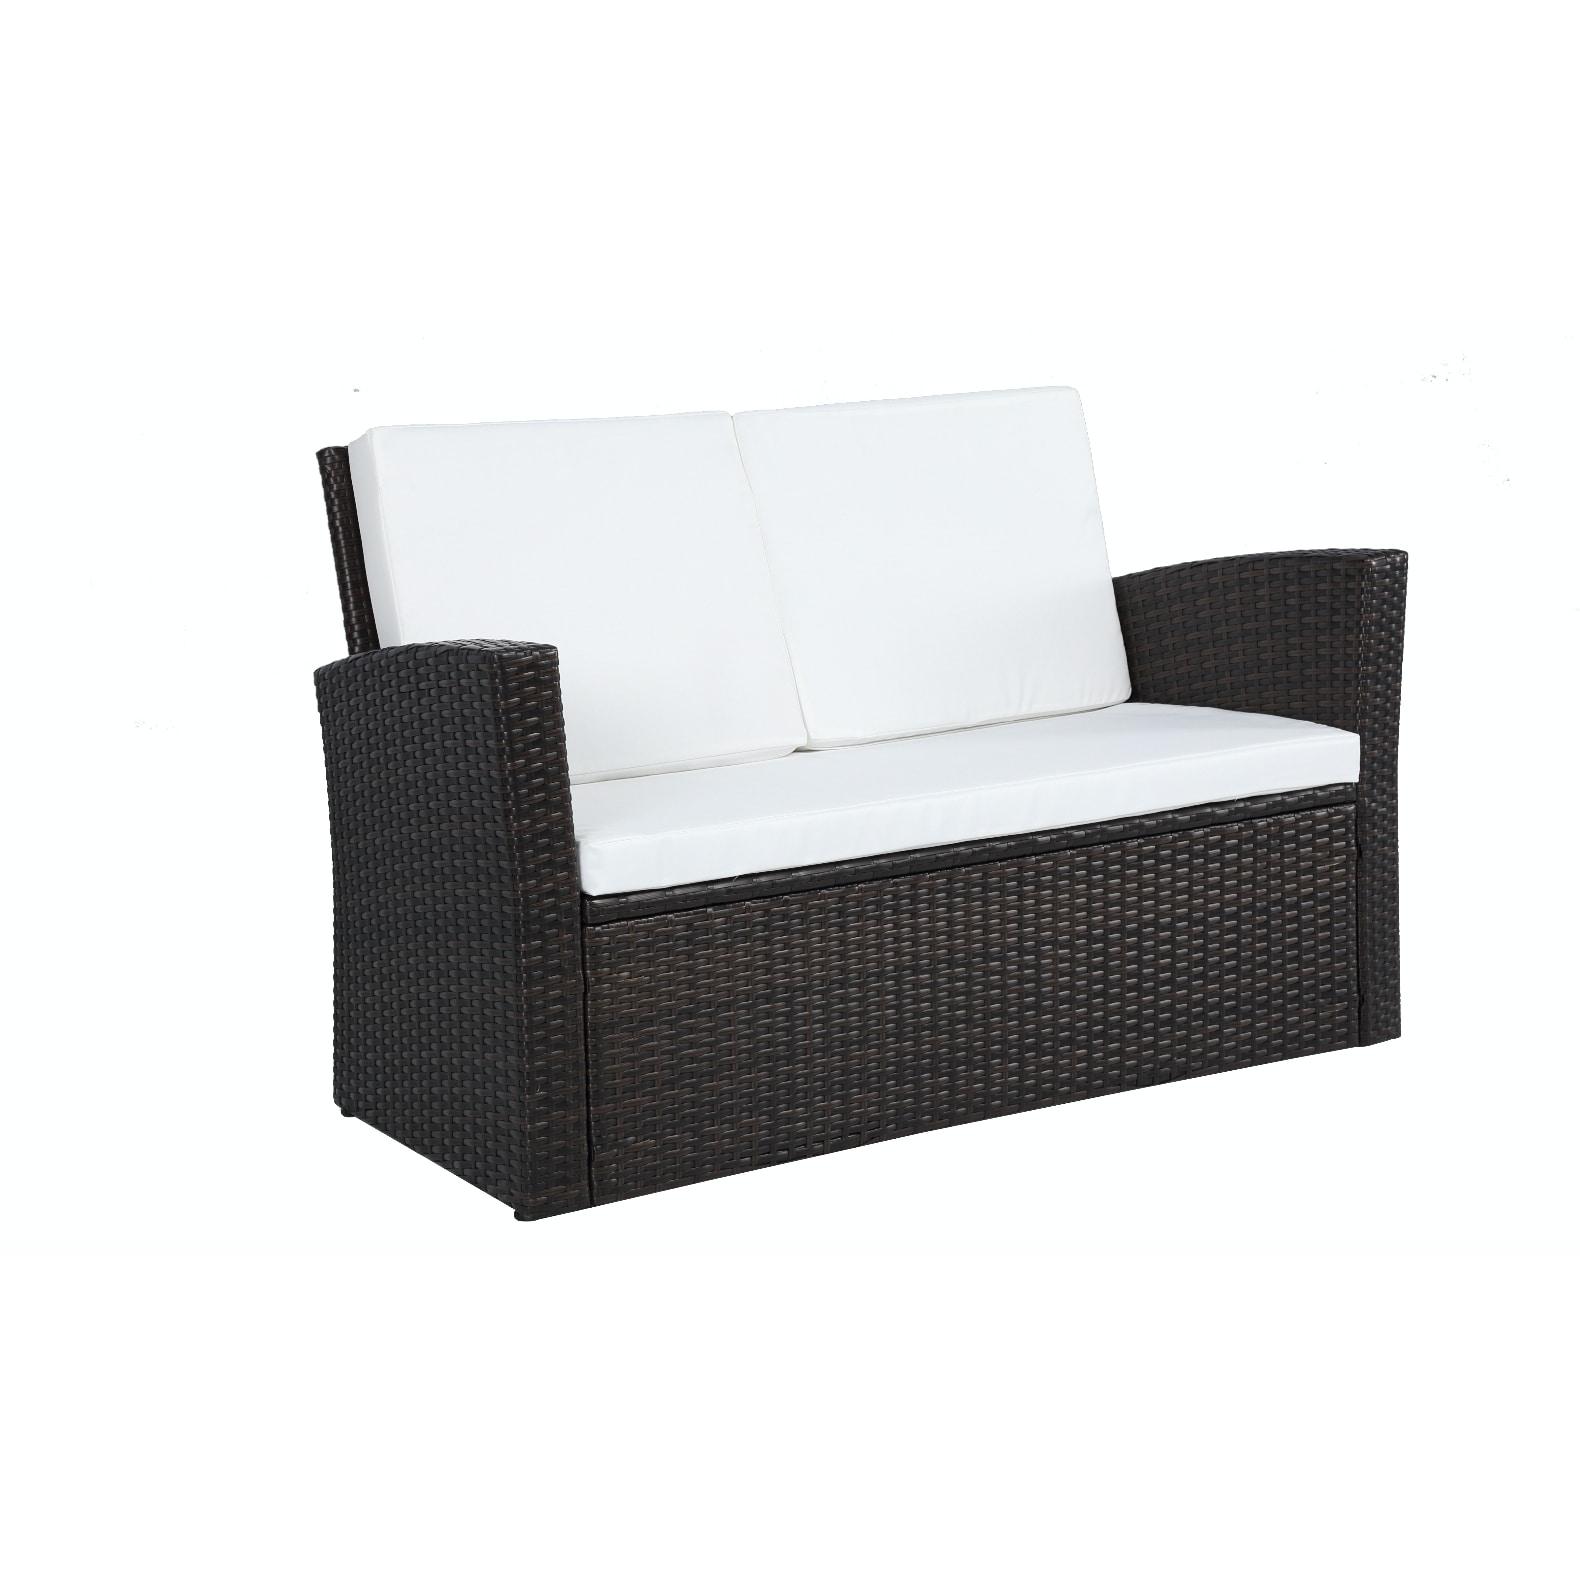 9e96c78b83d2 Shop Baner Garden Outdoor Furniture Complete Patio 4 pieces Cushion PE  Wicker Rattan Garden Set, Black - Free Shipping Today - Overstock - 10812735